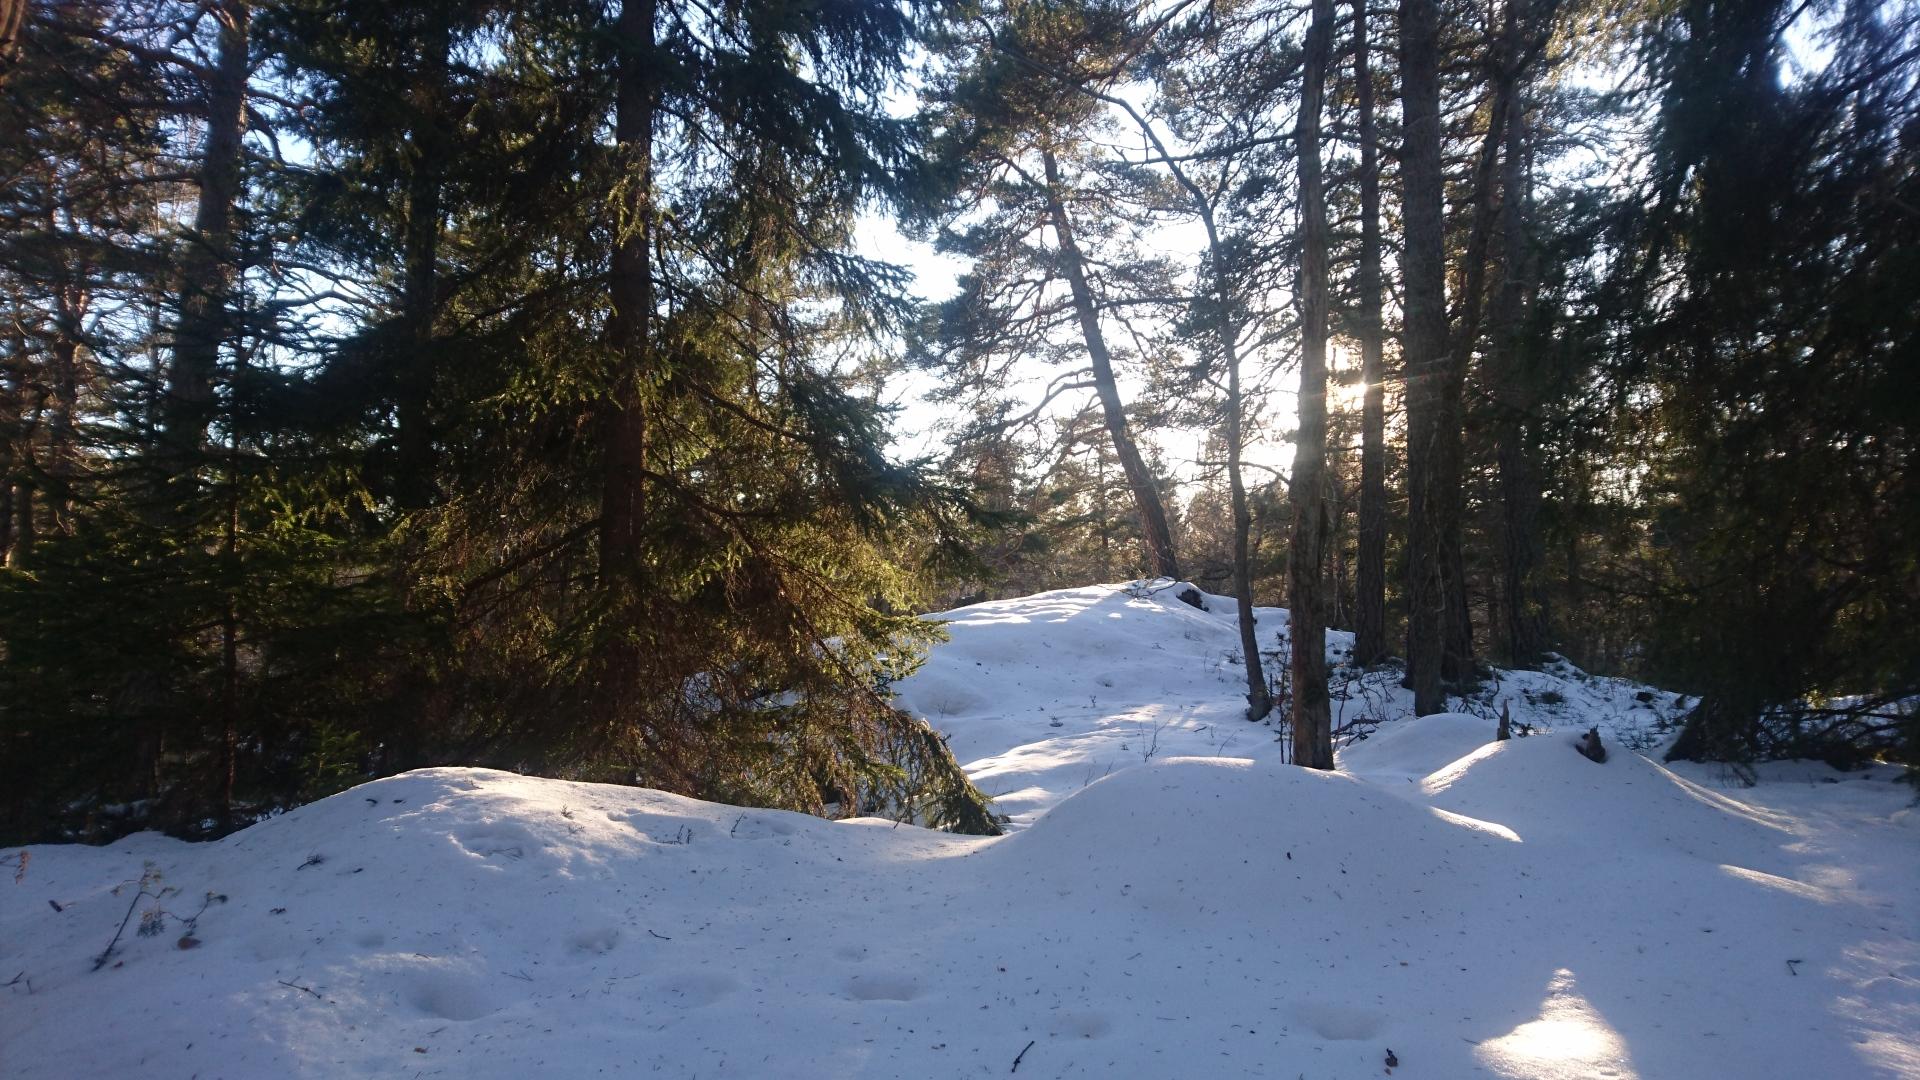 THE LONGEST WINTER // START OF THE SPRING SEASON